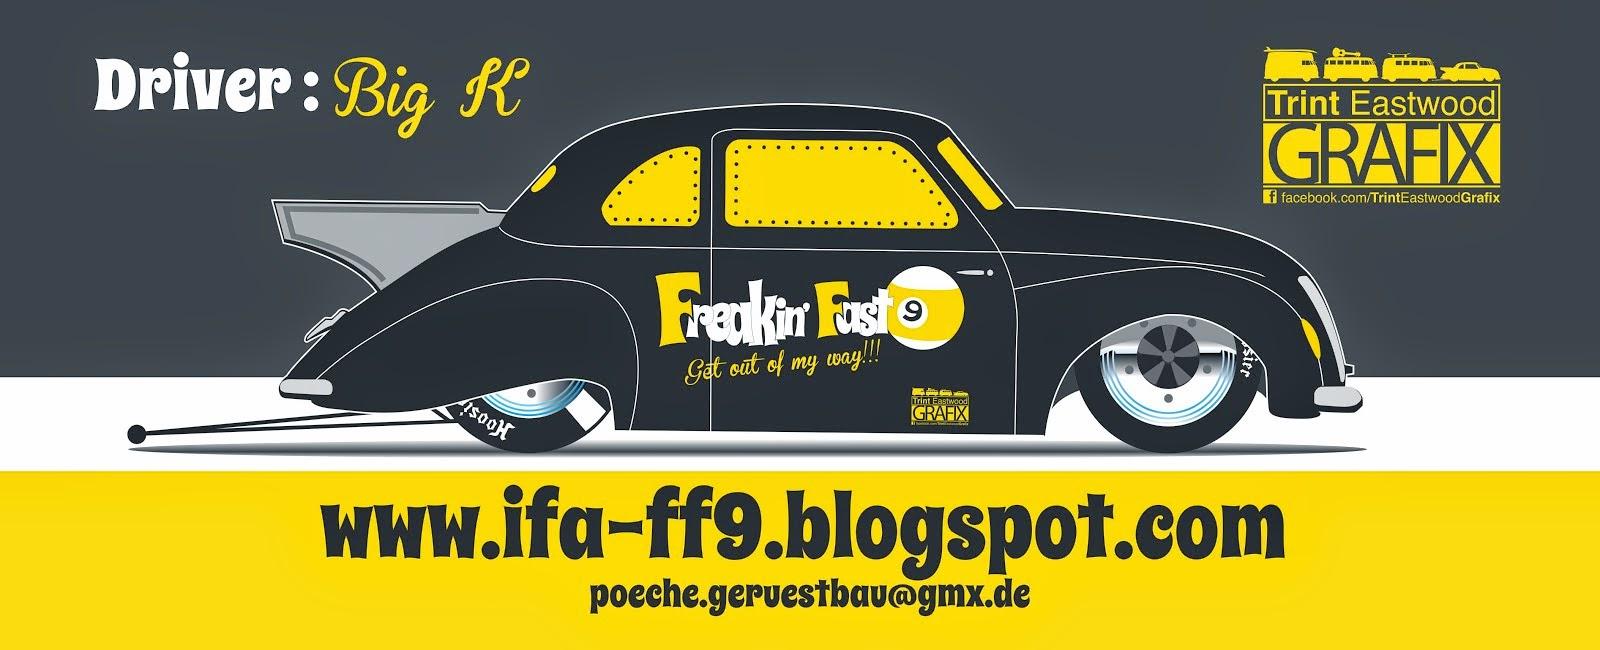 IFA ff9 Freakin'Fast9